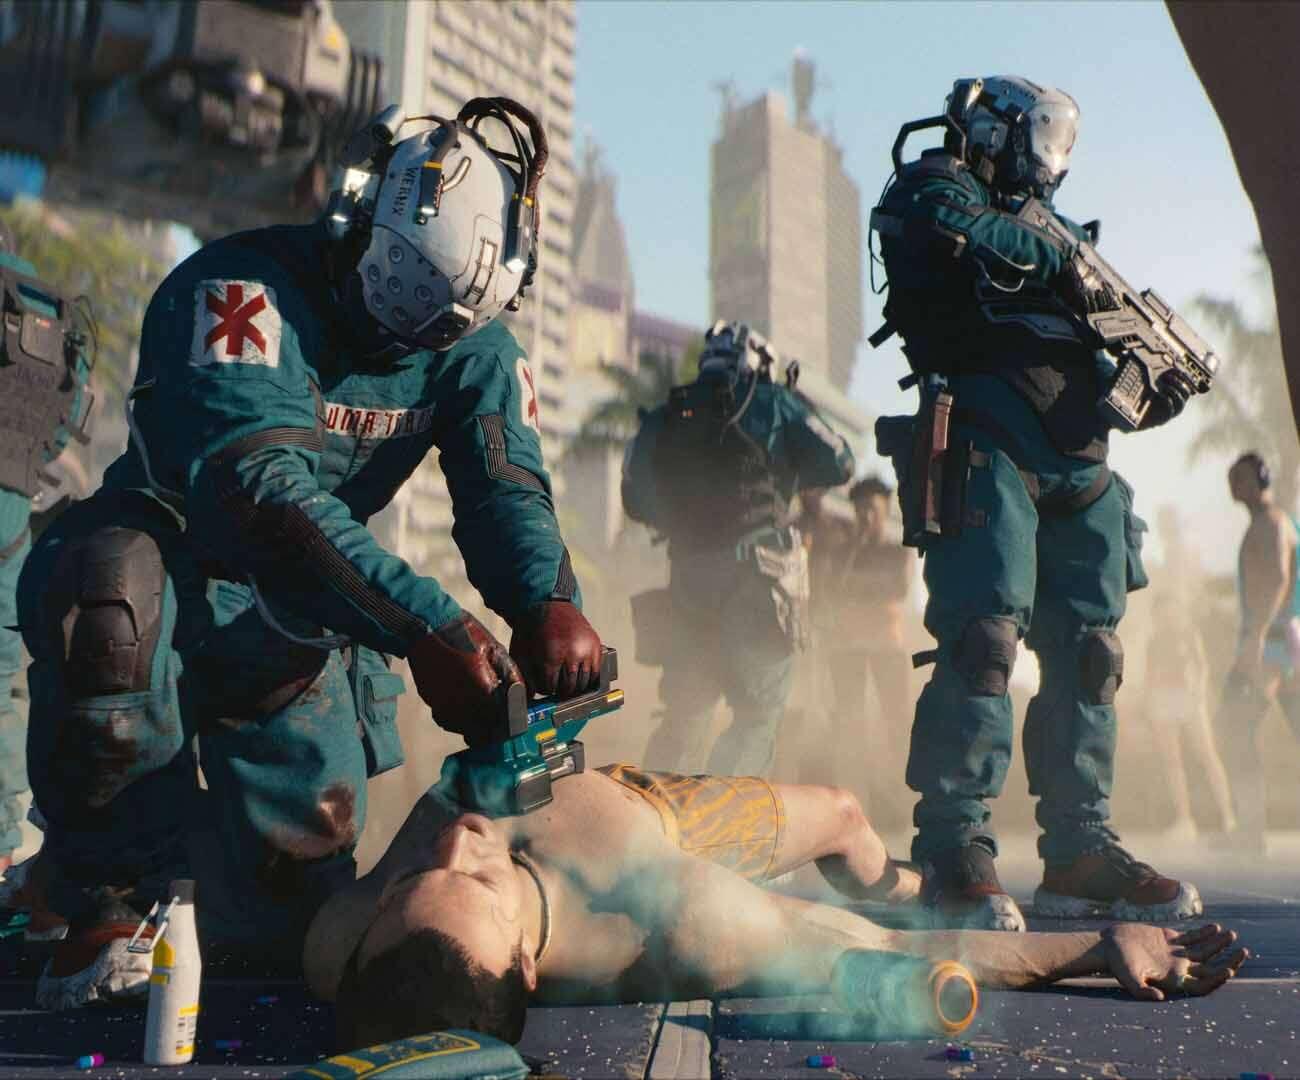 produkcja cyberpunk 2077